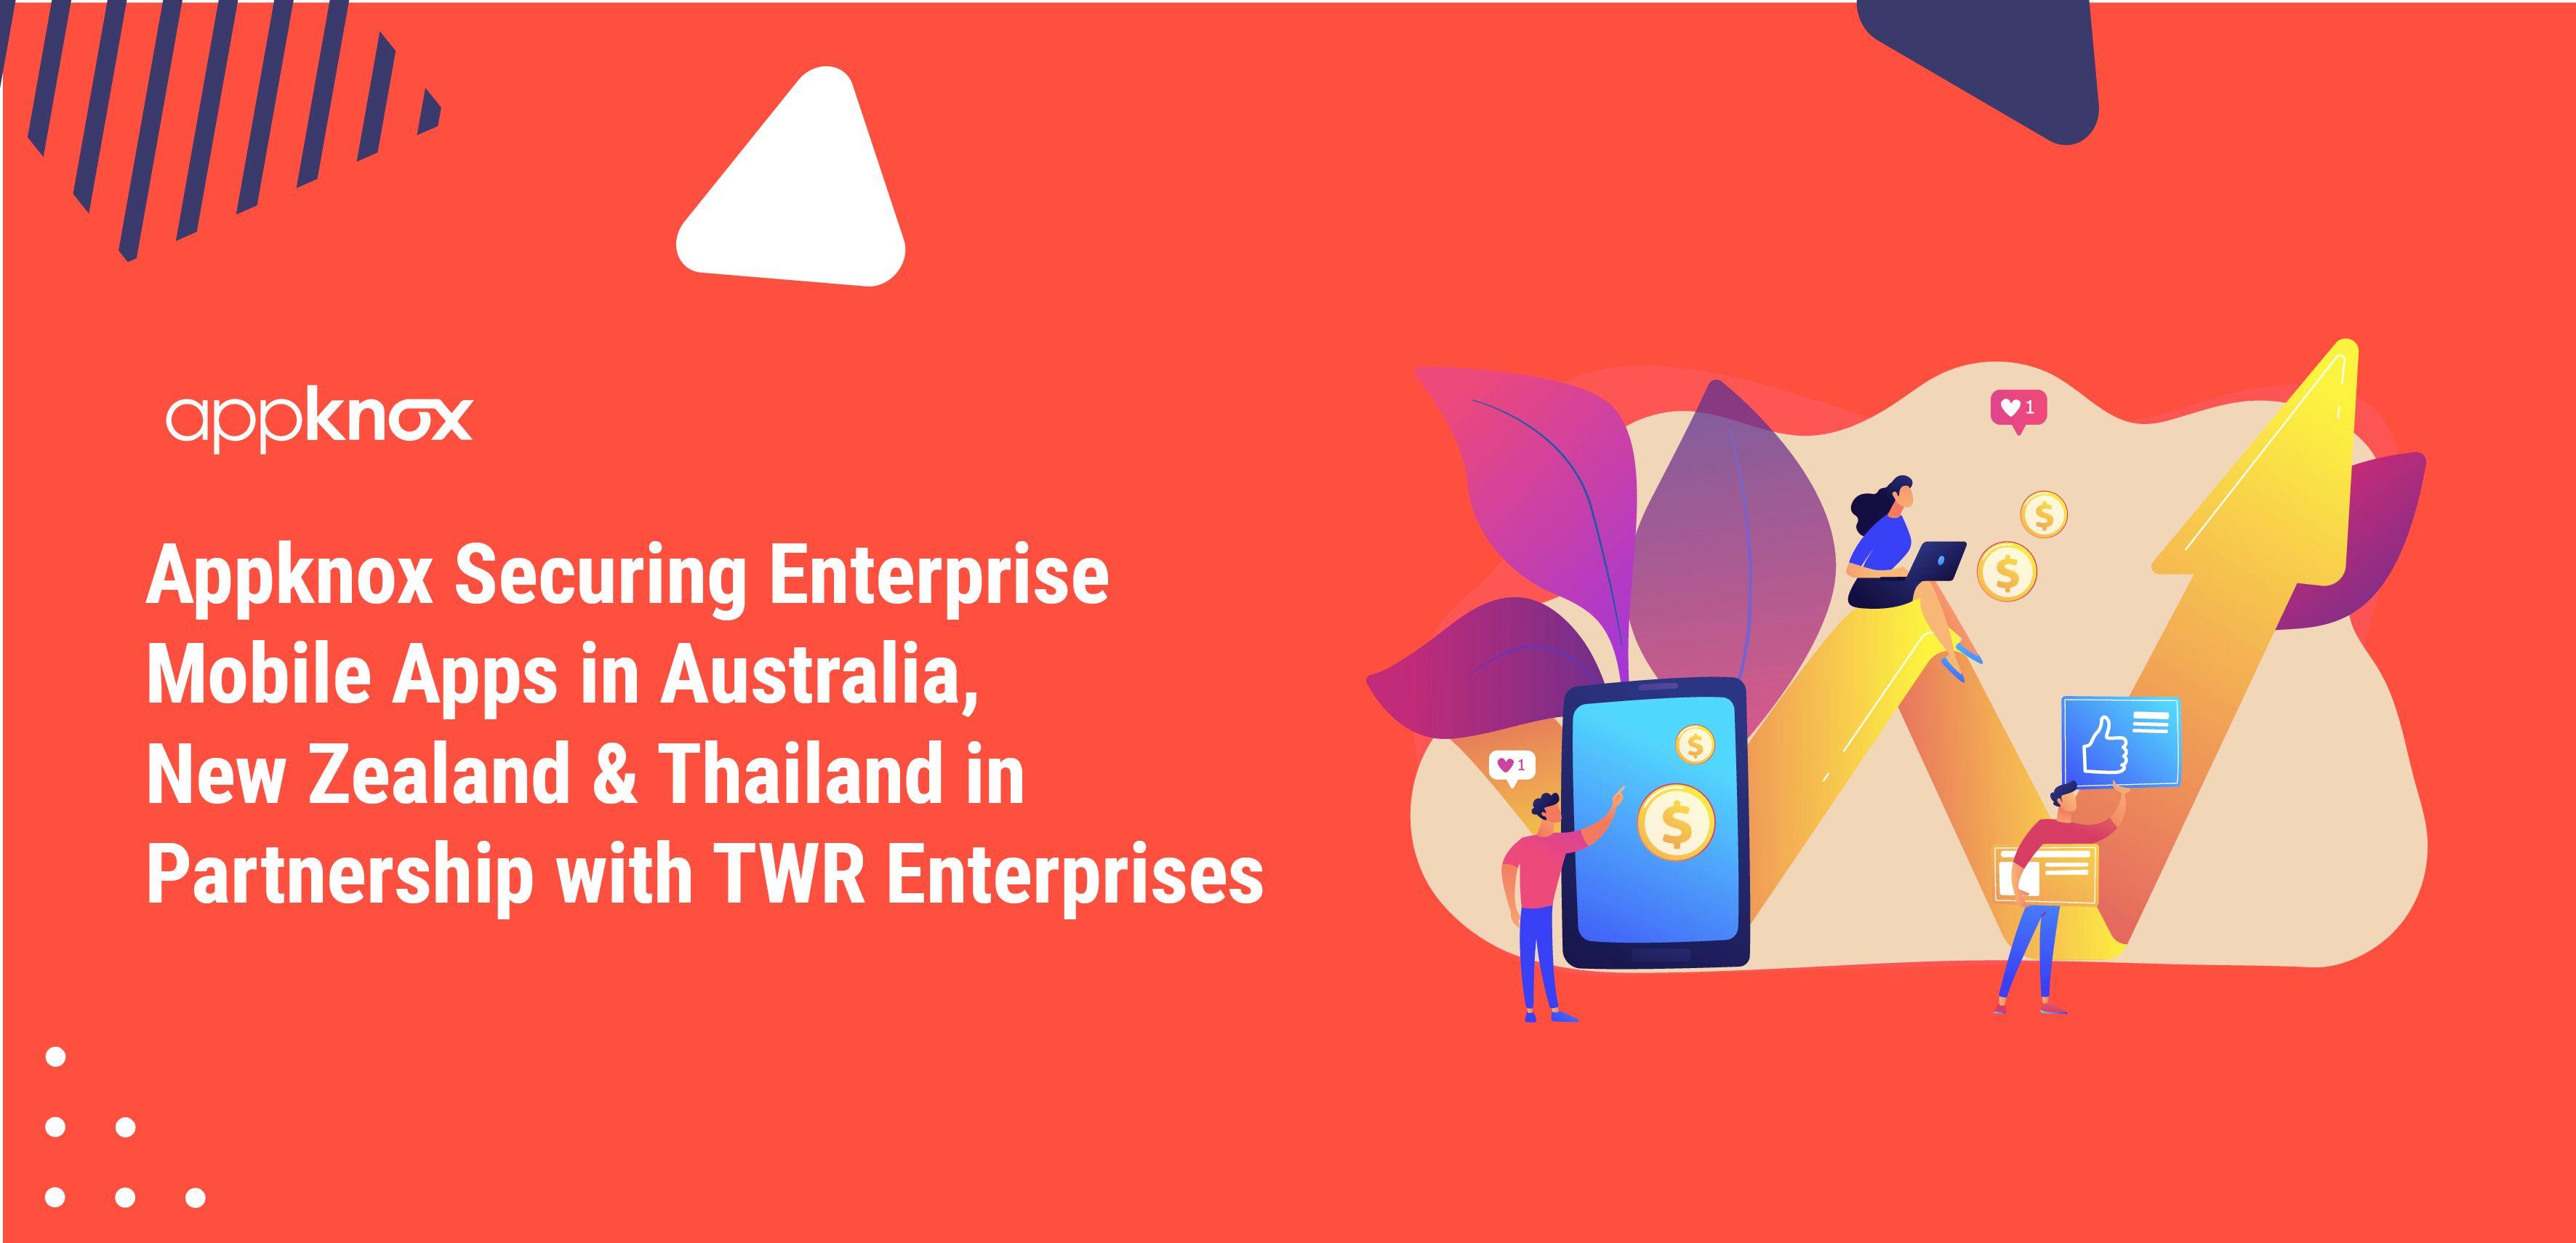 Appknox Securing Enterprise Mobile Apps in Australia, New Zealand & Thailand in Partnership with TWR Enterprises